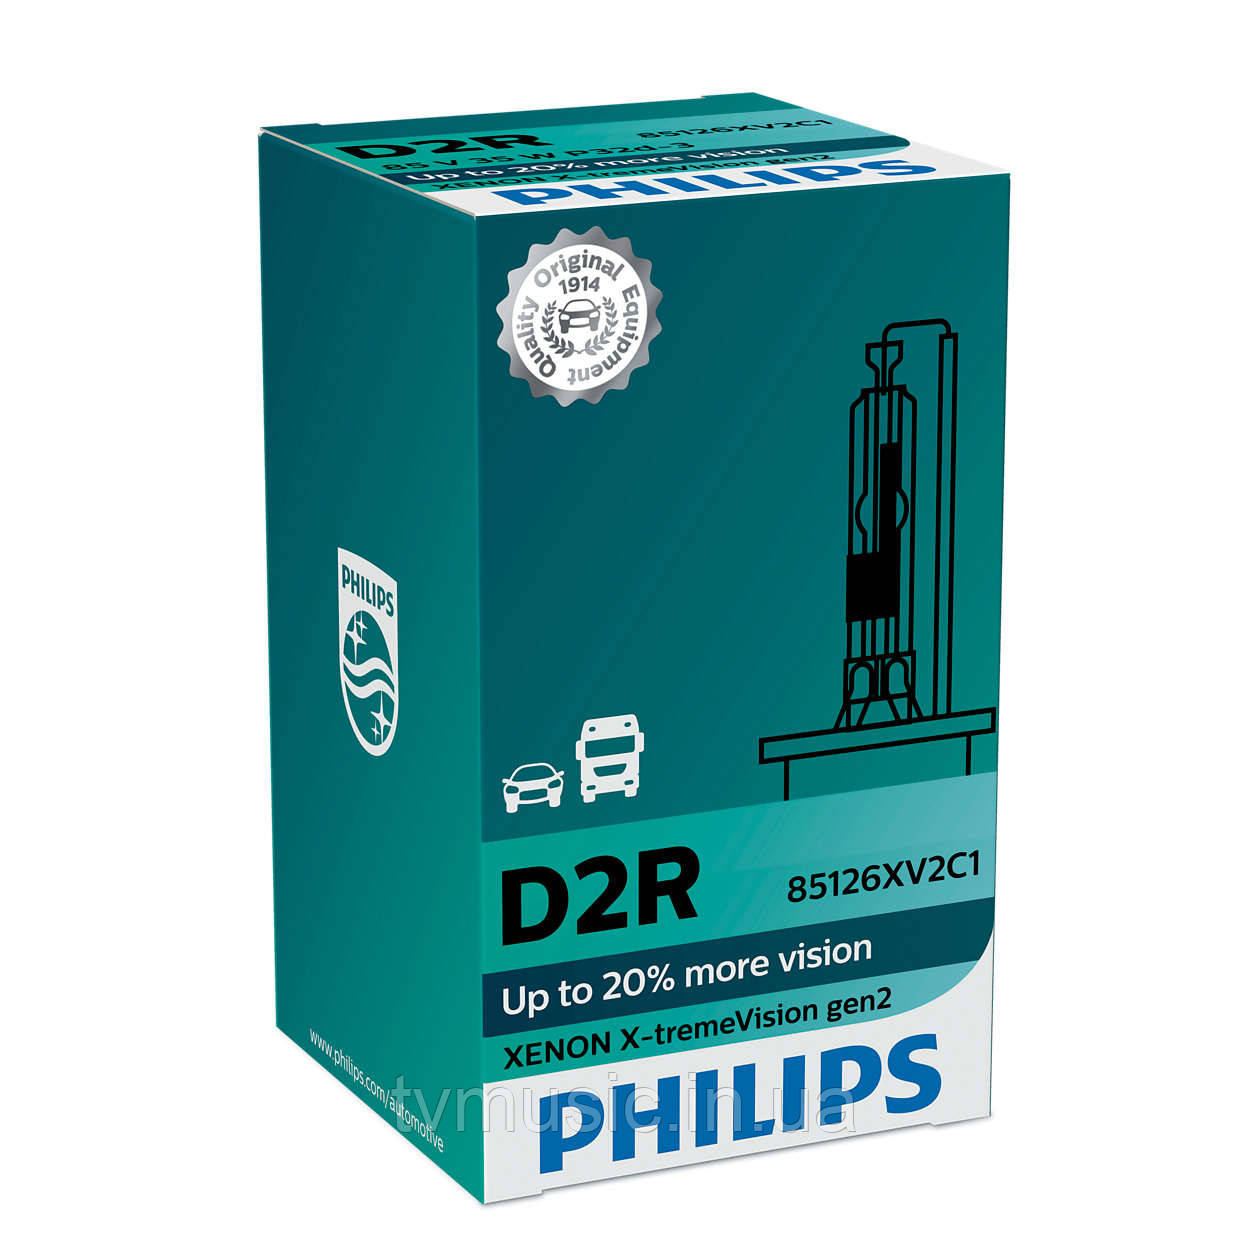 Ксеноновая лампа Philips Xenon X-treme Vision gen2 D2R 85V 35W (85126XV2C1)